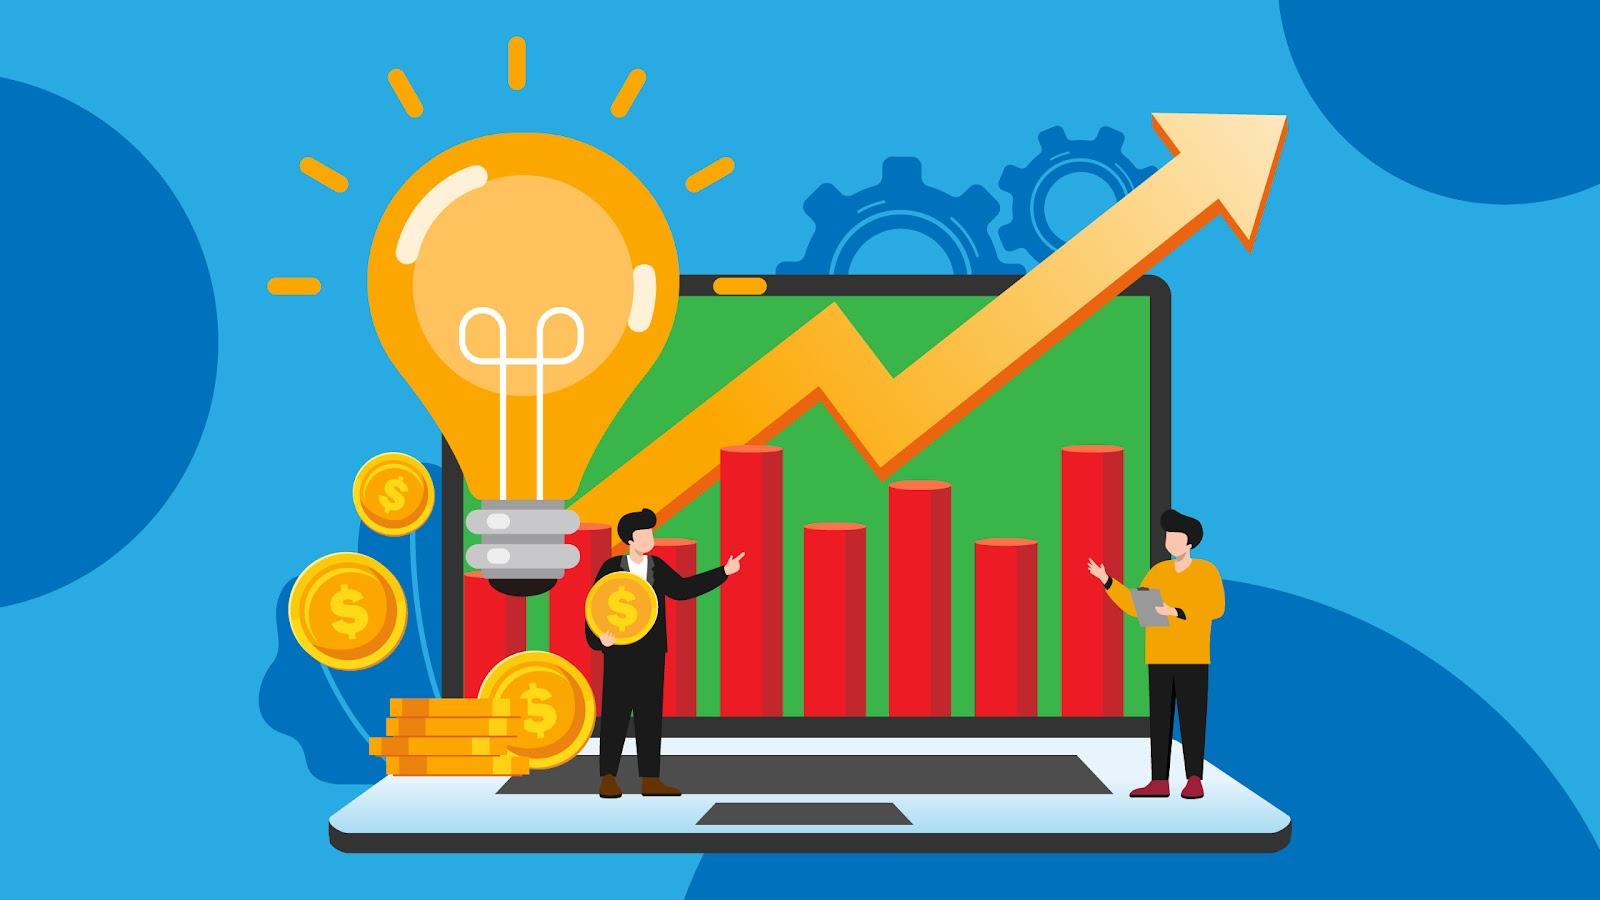 Graphic depicting sales effectiveness